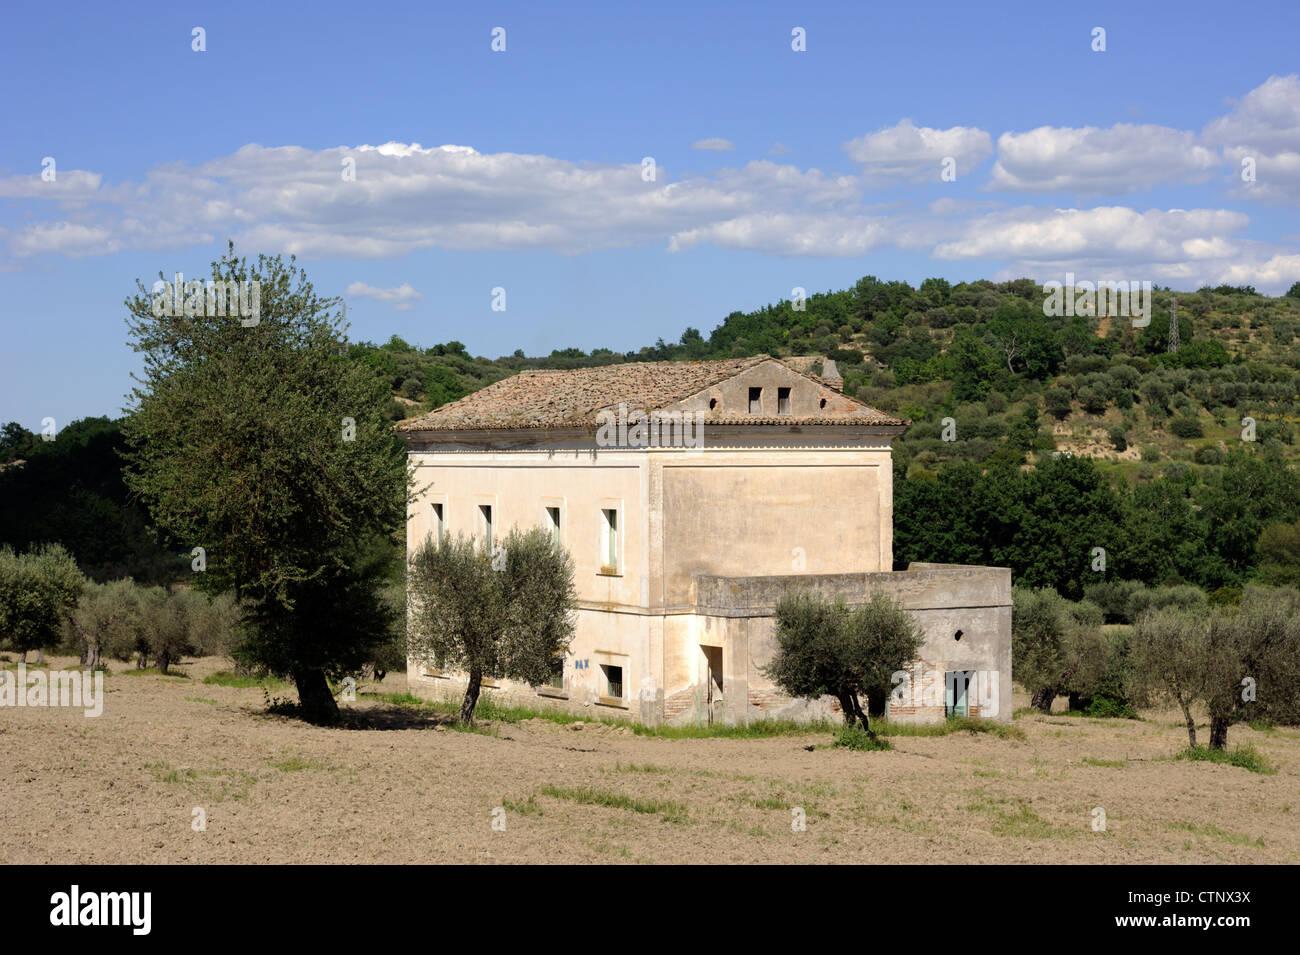 italy, basilicata, rural house - Stock Image